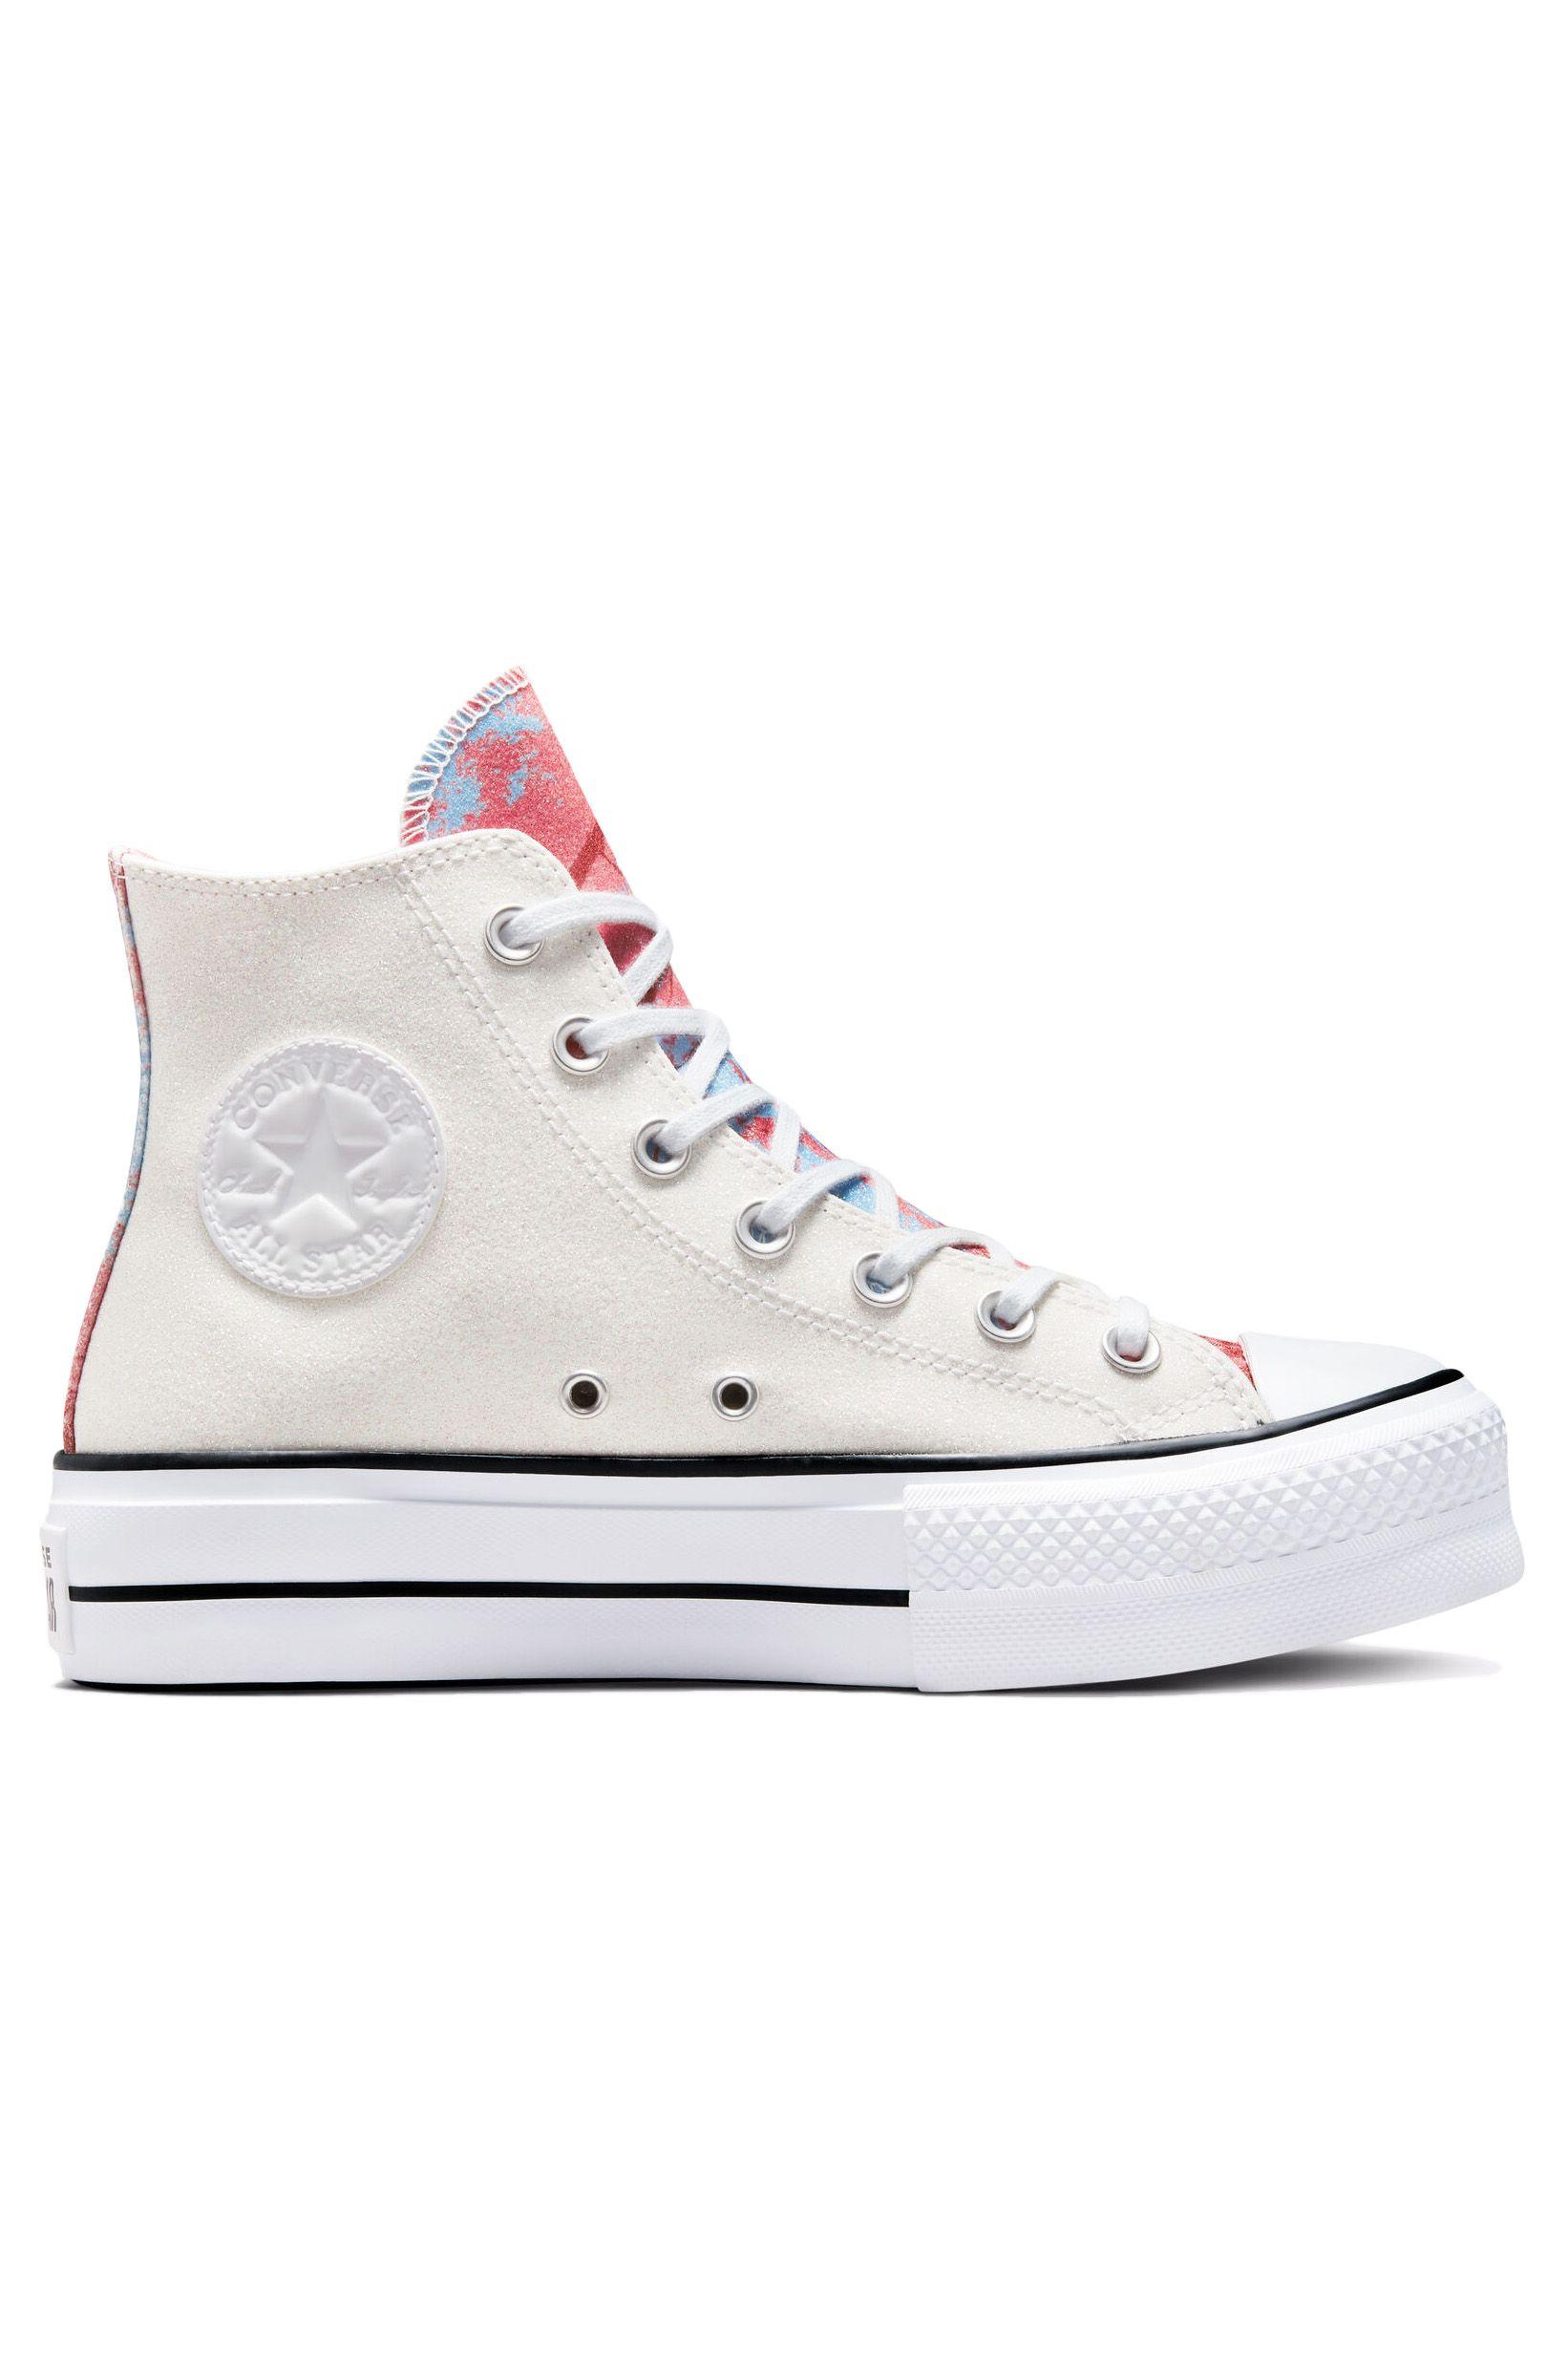 Converse Shoes CHUCK TAYLOR ALL STAR LIFT HI White/Pink Salt/Black